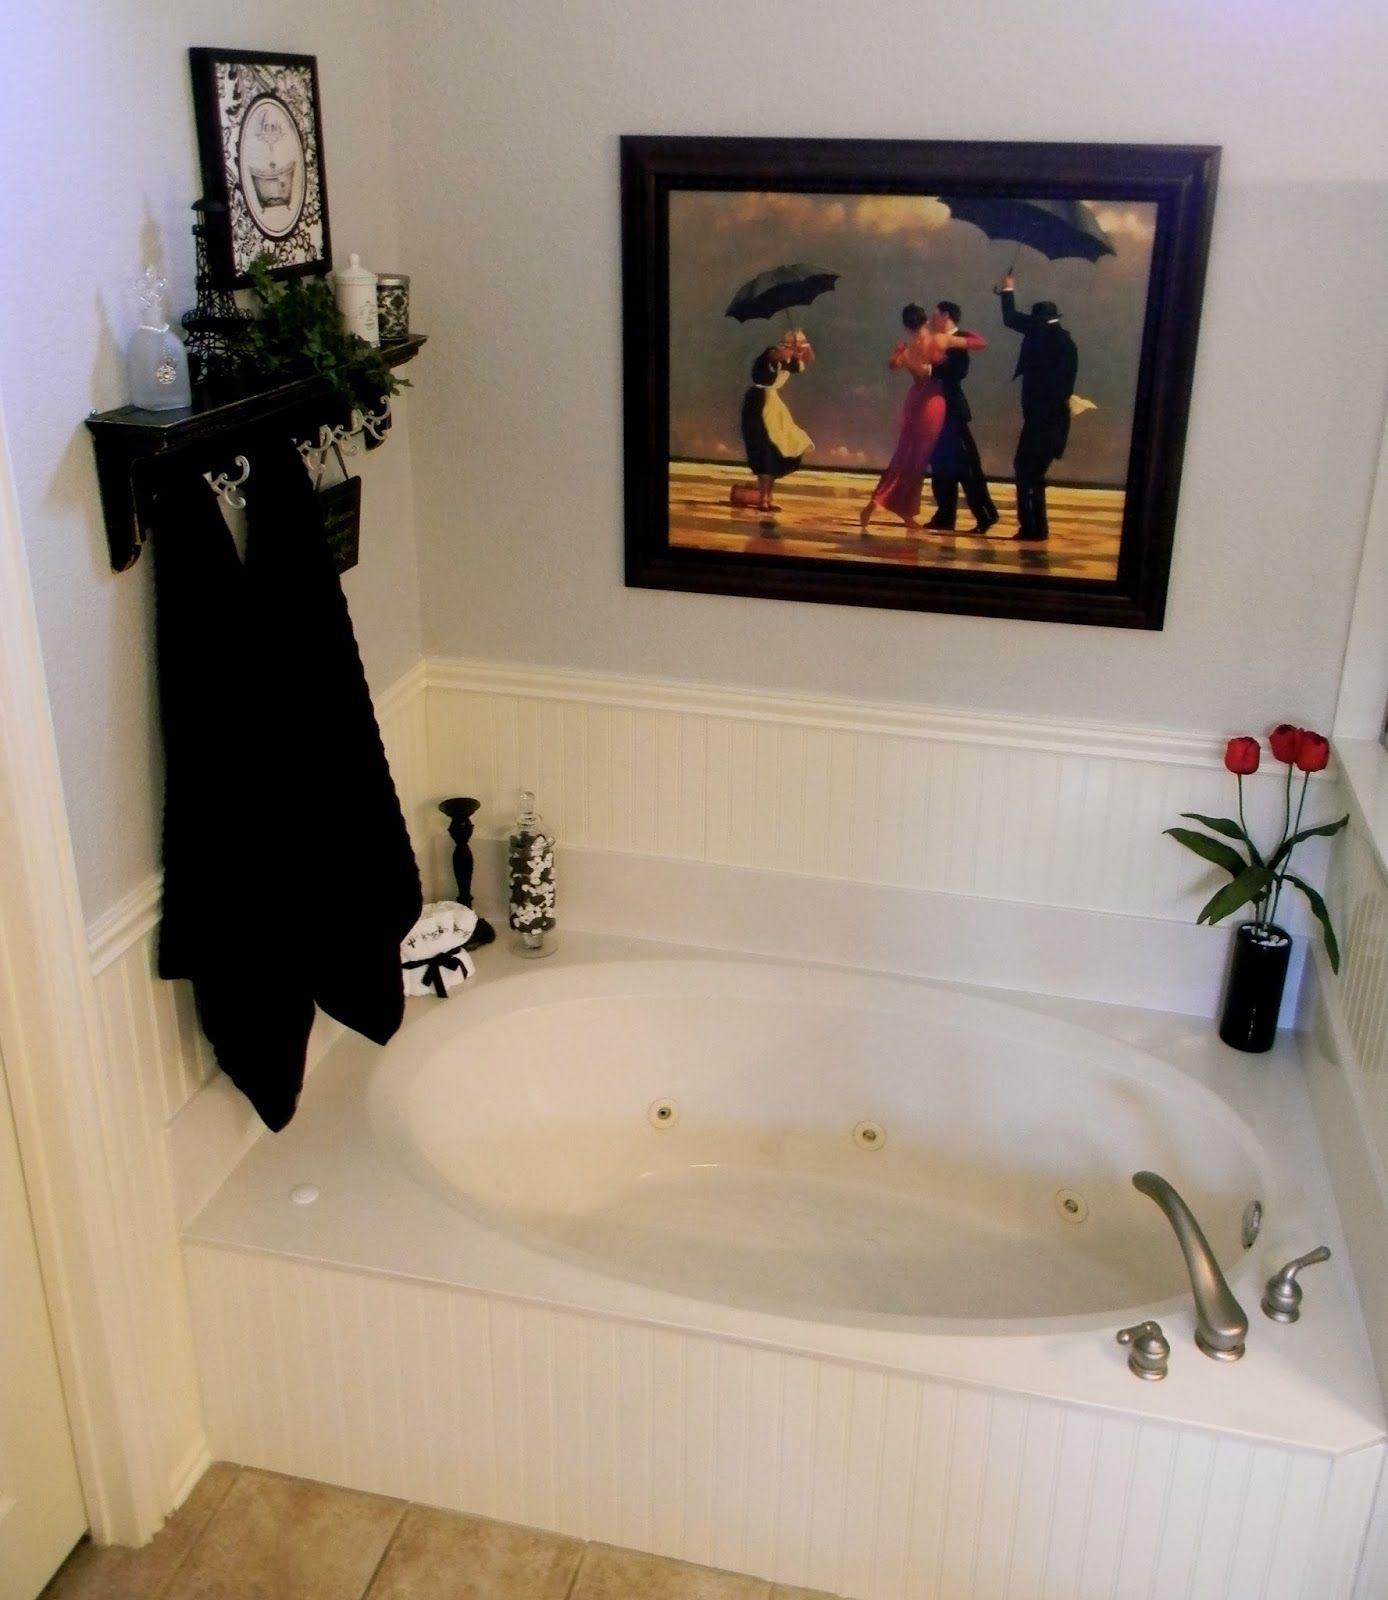 diy beadboard tub surround for the home master. Black Bedroom Furniture Sets. Home Design Ideas